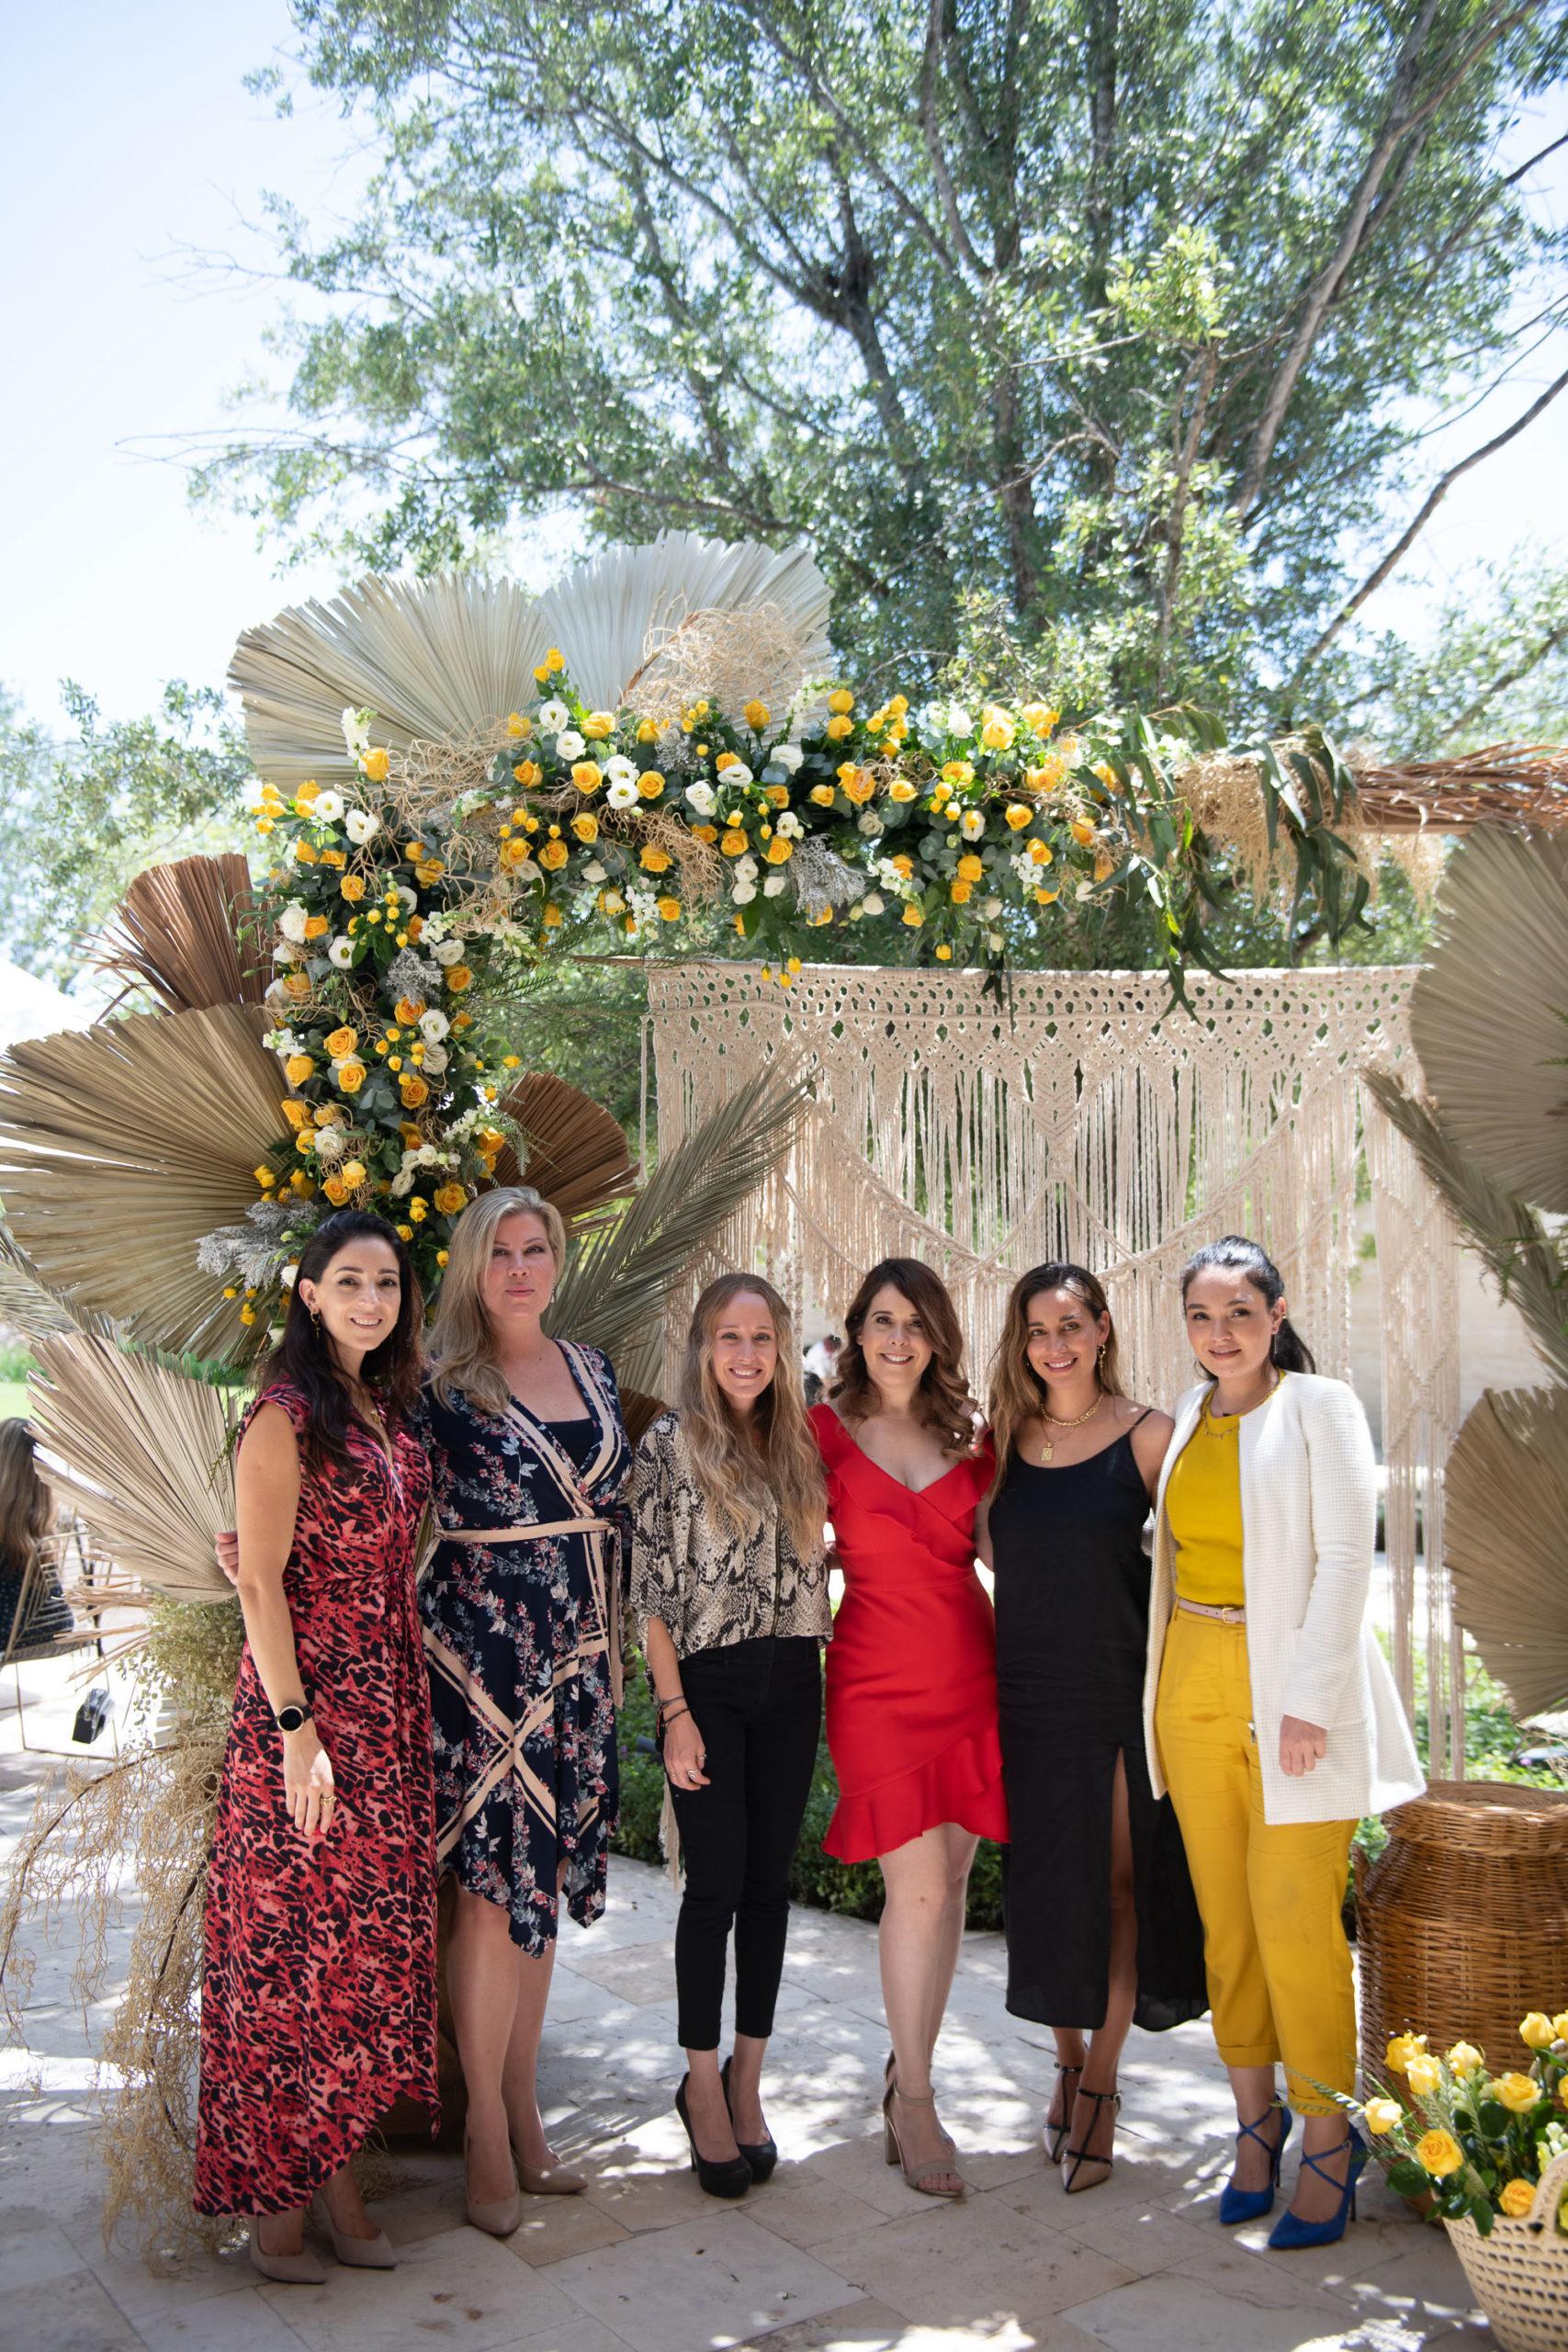 Daniela González, Elyn Gustafson, Samantha Rivera, Romy Obando, Gisela Rivera y Anabel Suárez.